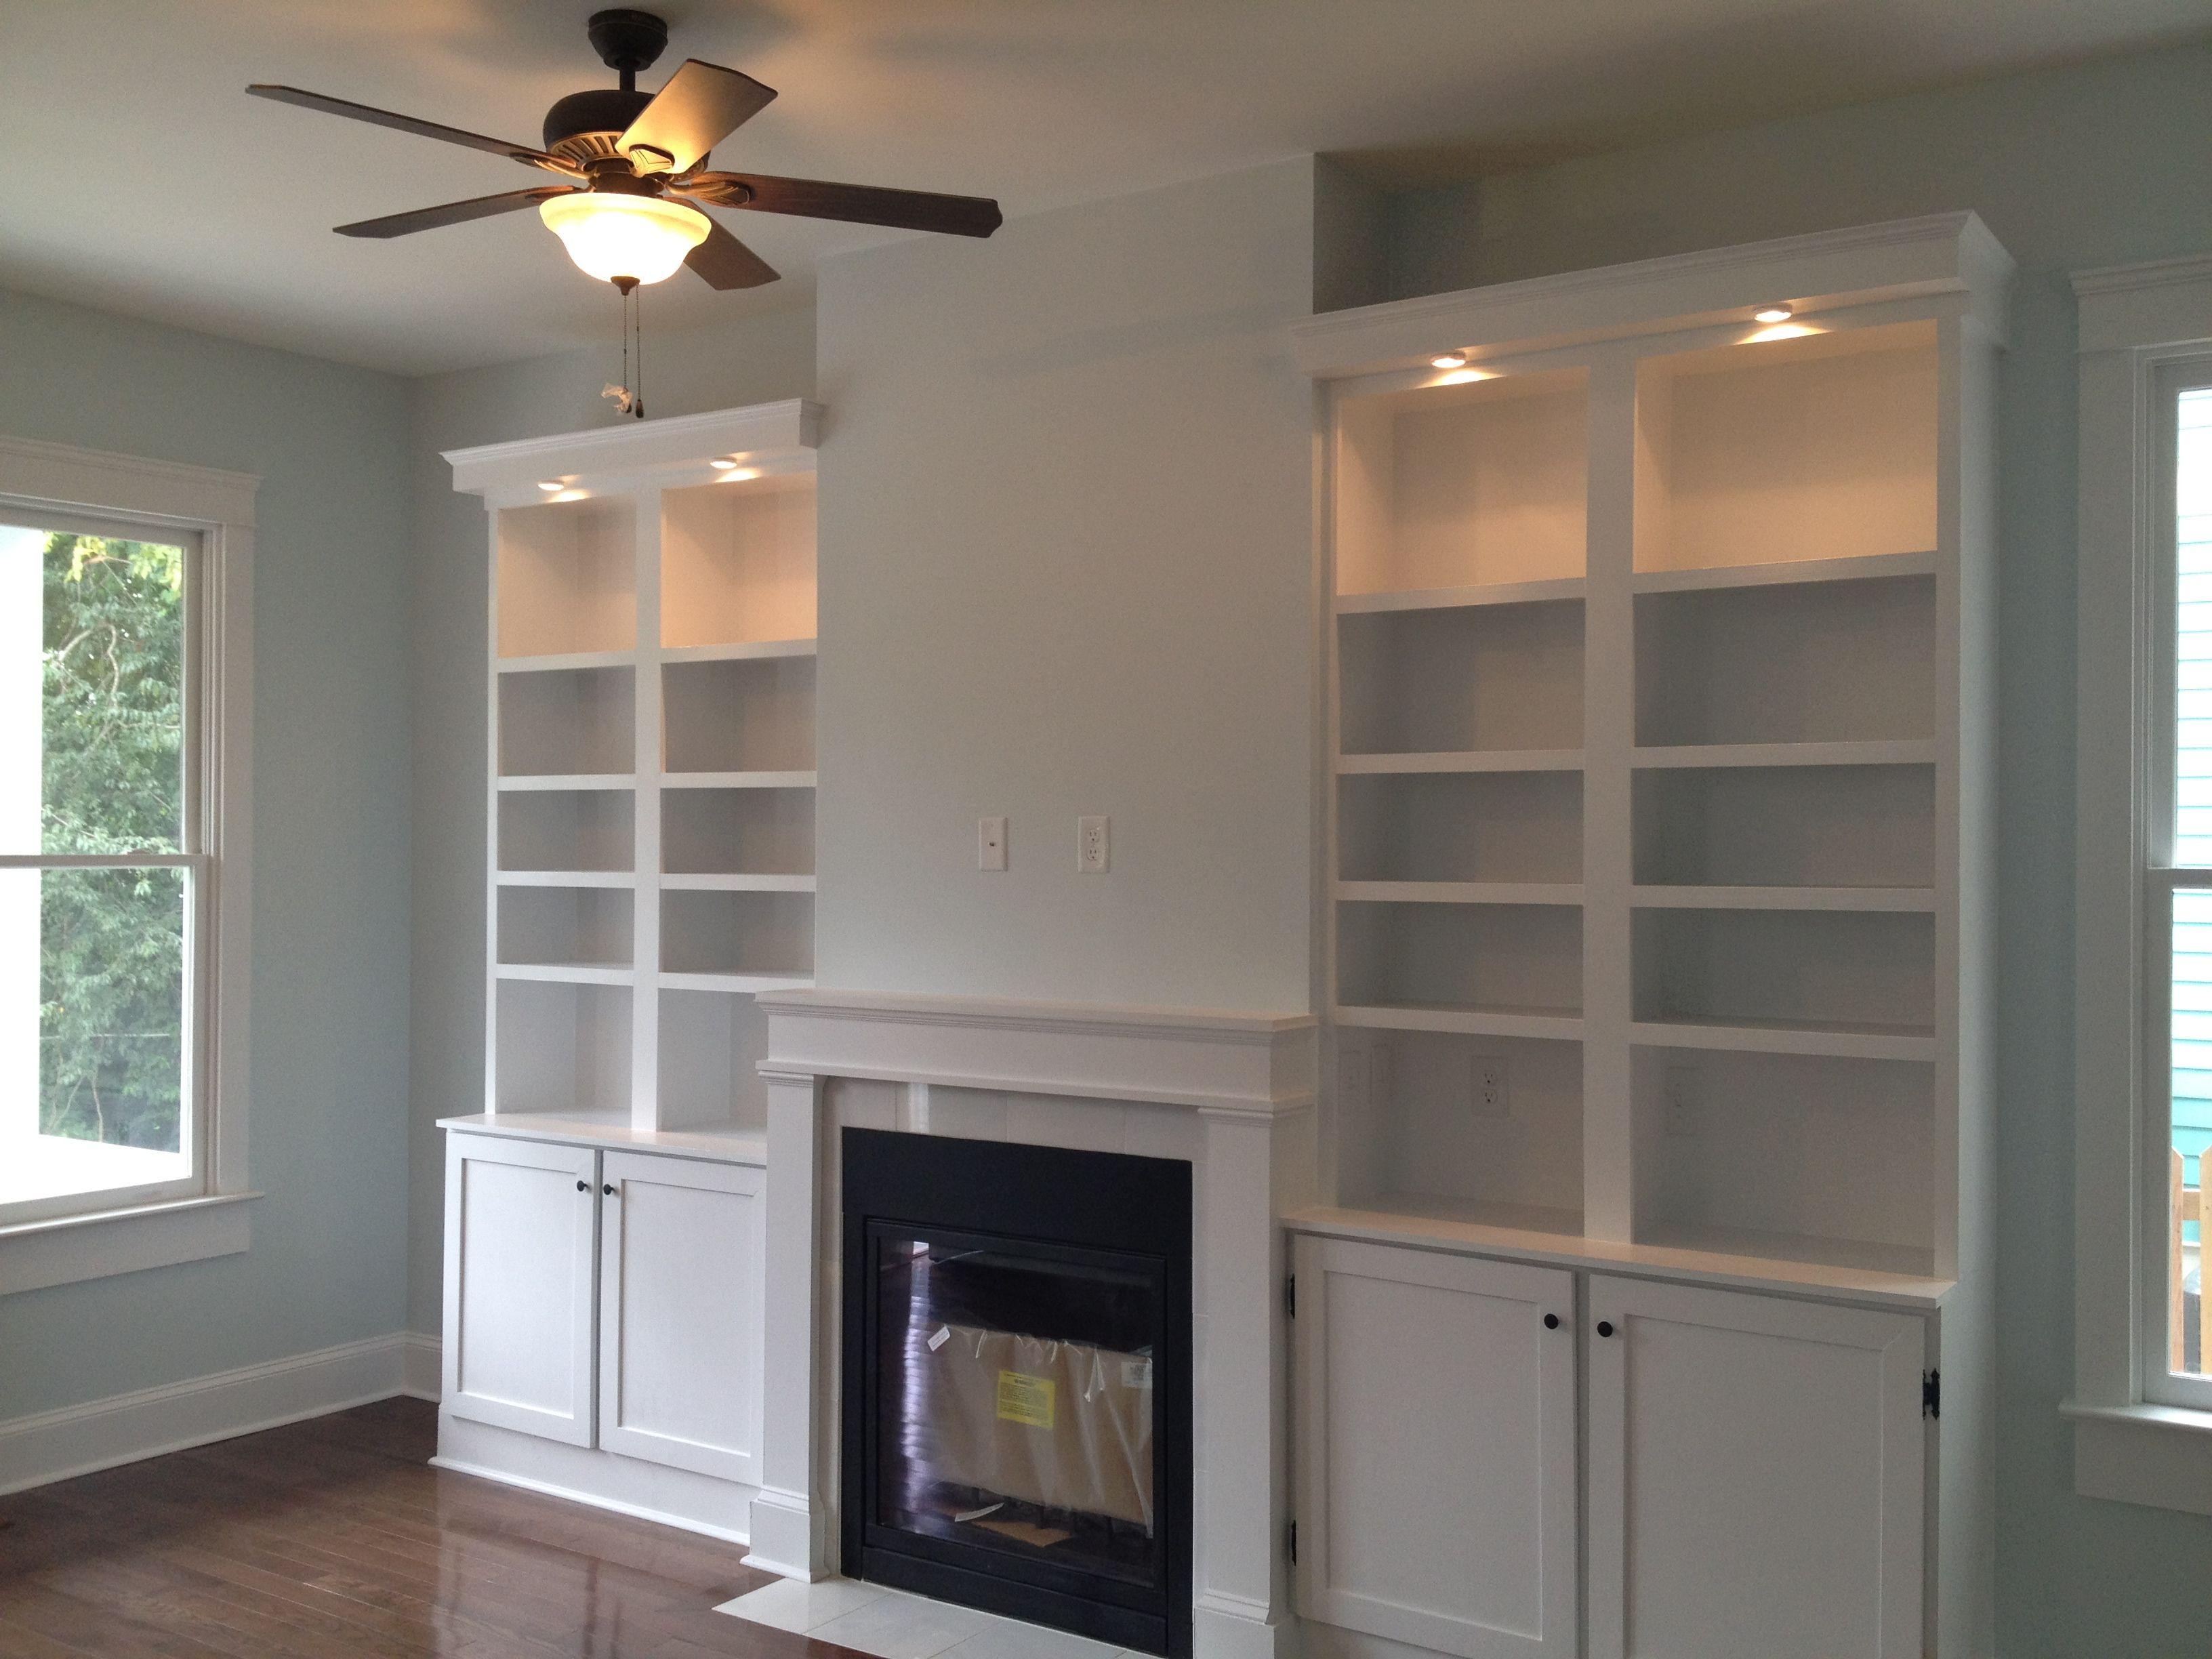 Fireplace With Solid Wood Built Ins Adjustable Shelves Cabinet Doors And Lighting Fireplace Shelves Shelves In Bedroom Living Room Update